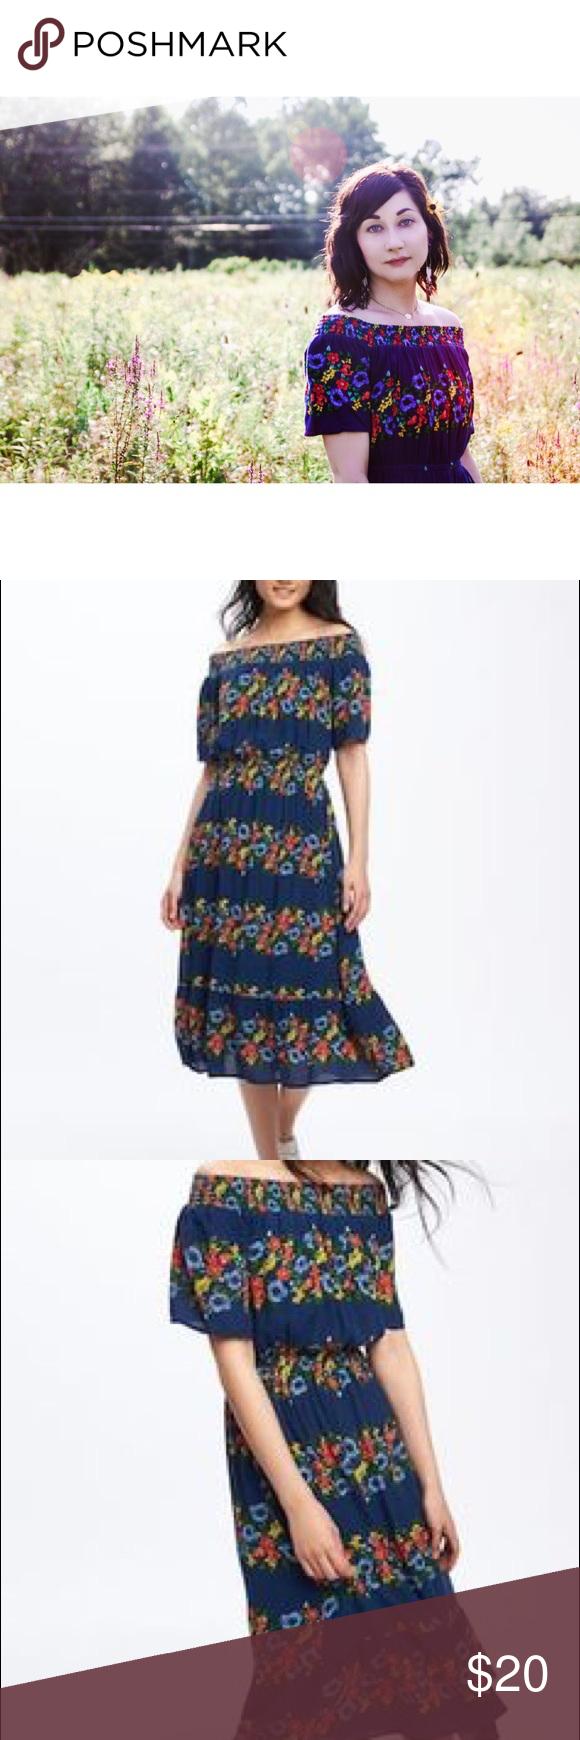 f31f28cbaf0e Old Navy • Blue Floral Off Shoulder Dress Worn once for 30 minutes for a  photo